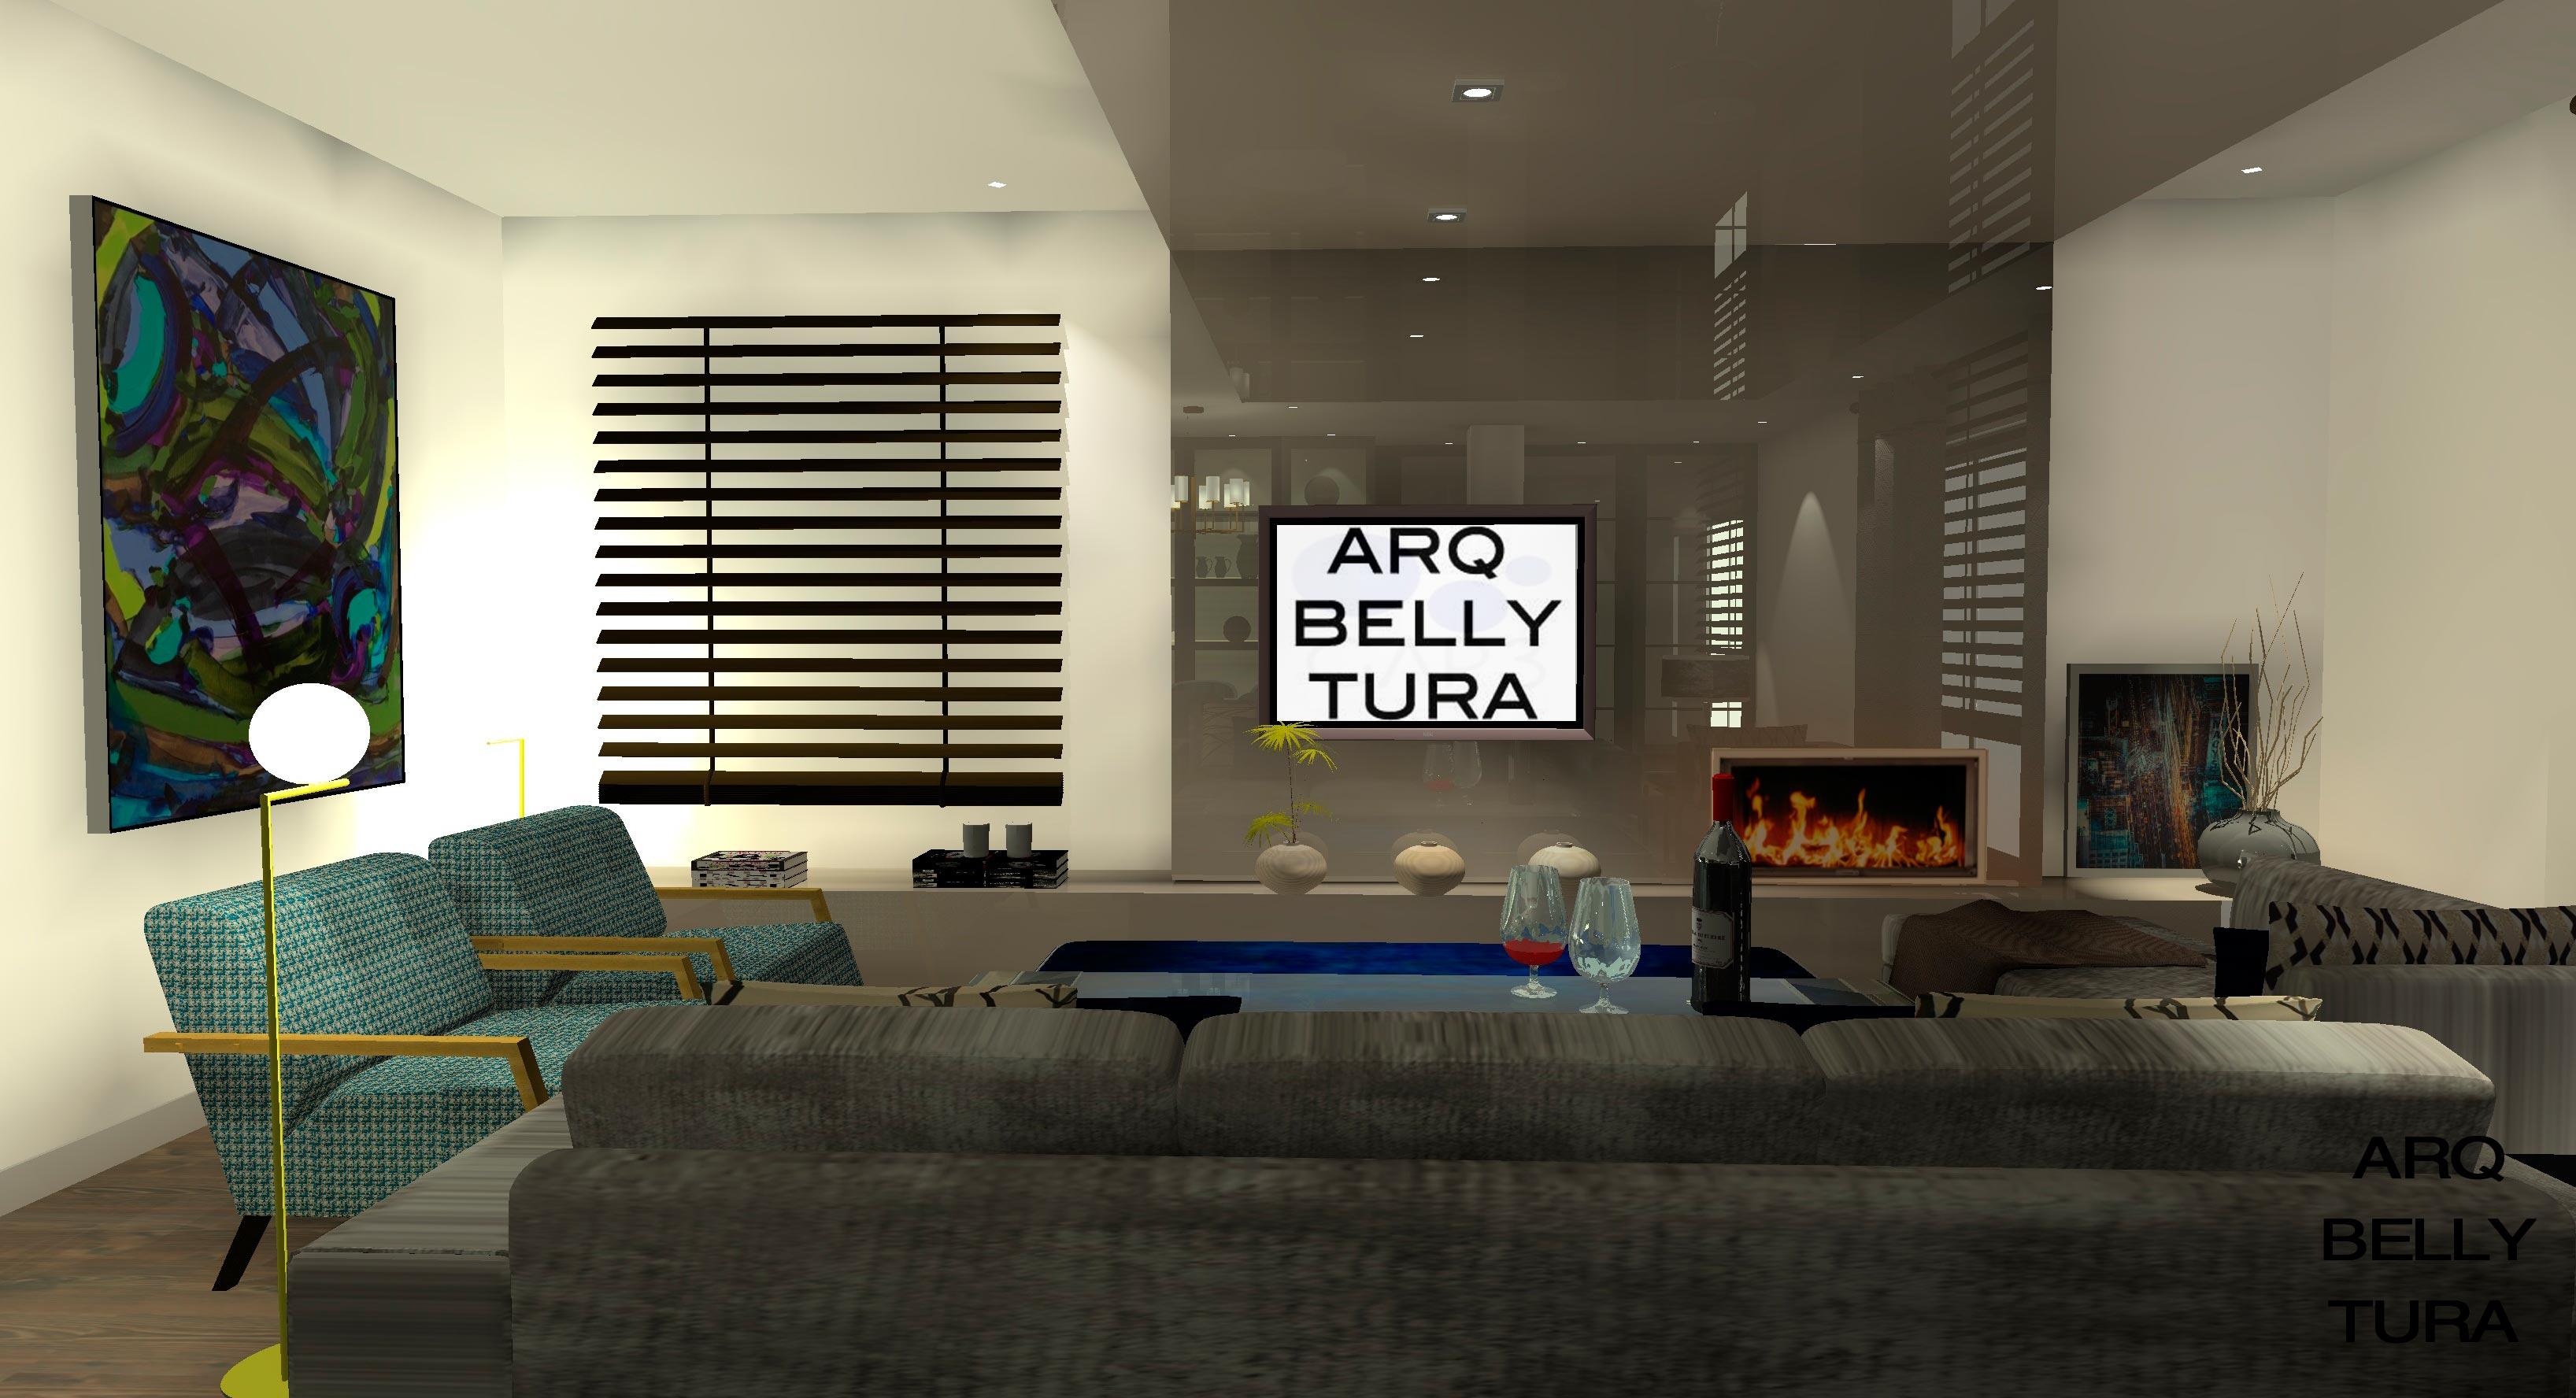 http://arqbellytura.com/wp-content/uploads/2017/02/salón4.jpg